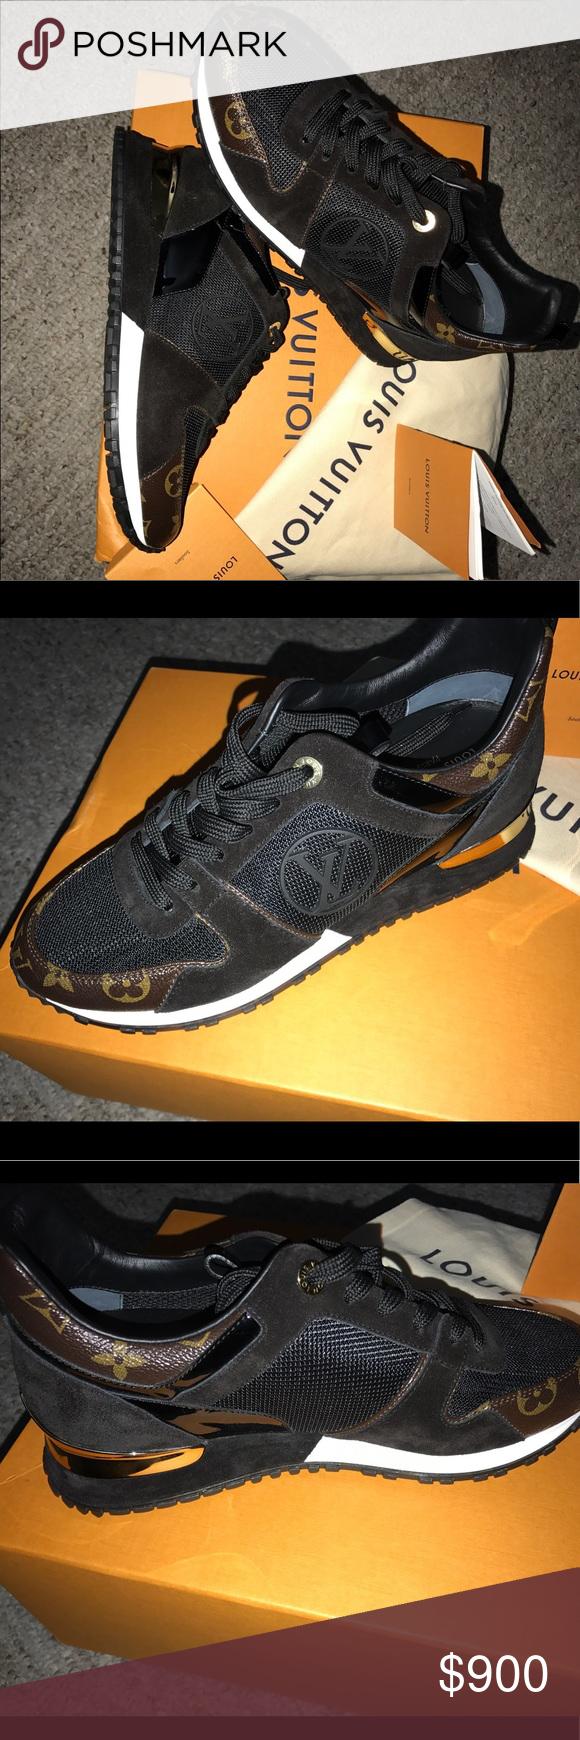 24a8ec47e0a7 LOUIS VUITTON RUN AWAY BLACK WOMENS SNEAKERS Louis Vuitton sneakers Louis  Vuitton Shoes Athletic Shoes